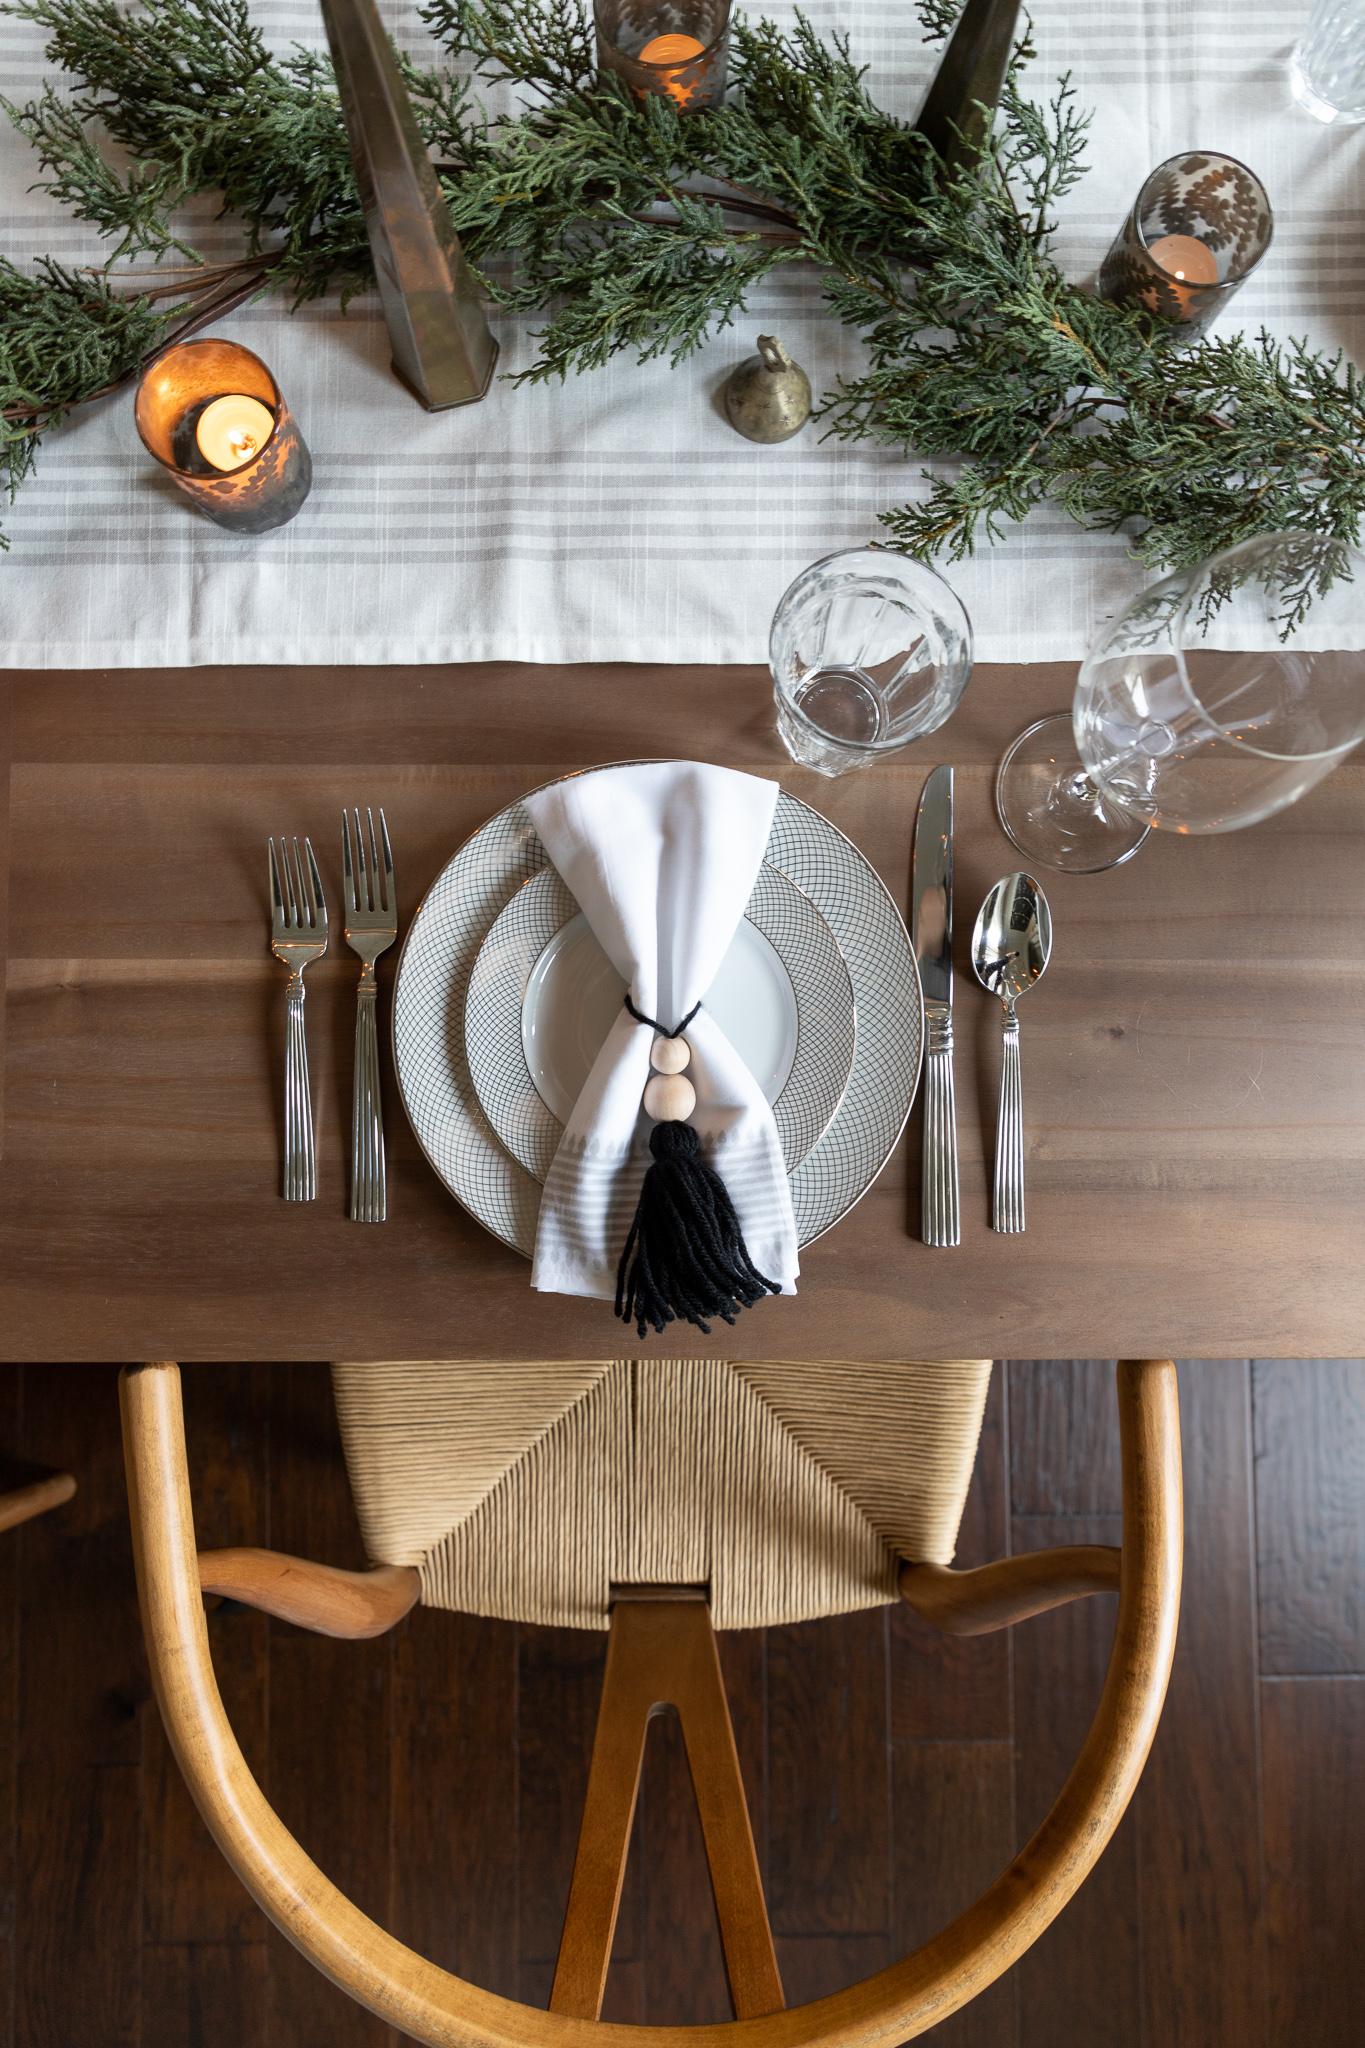 Serena & Lily Brela napkins, modern Christmas tablescape ideas